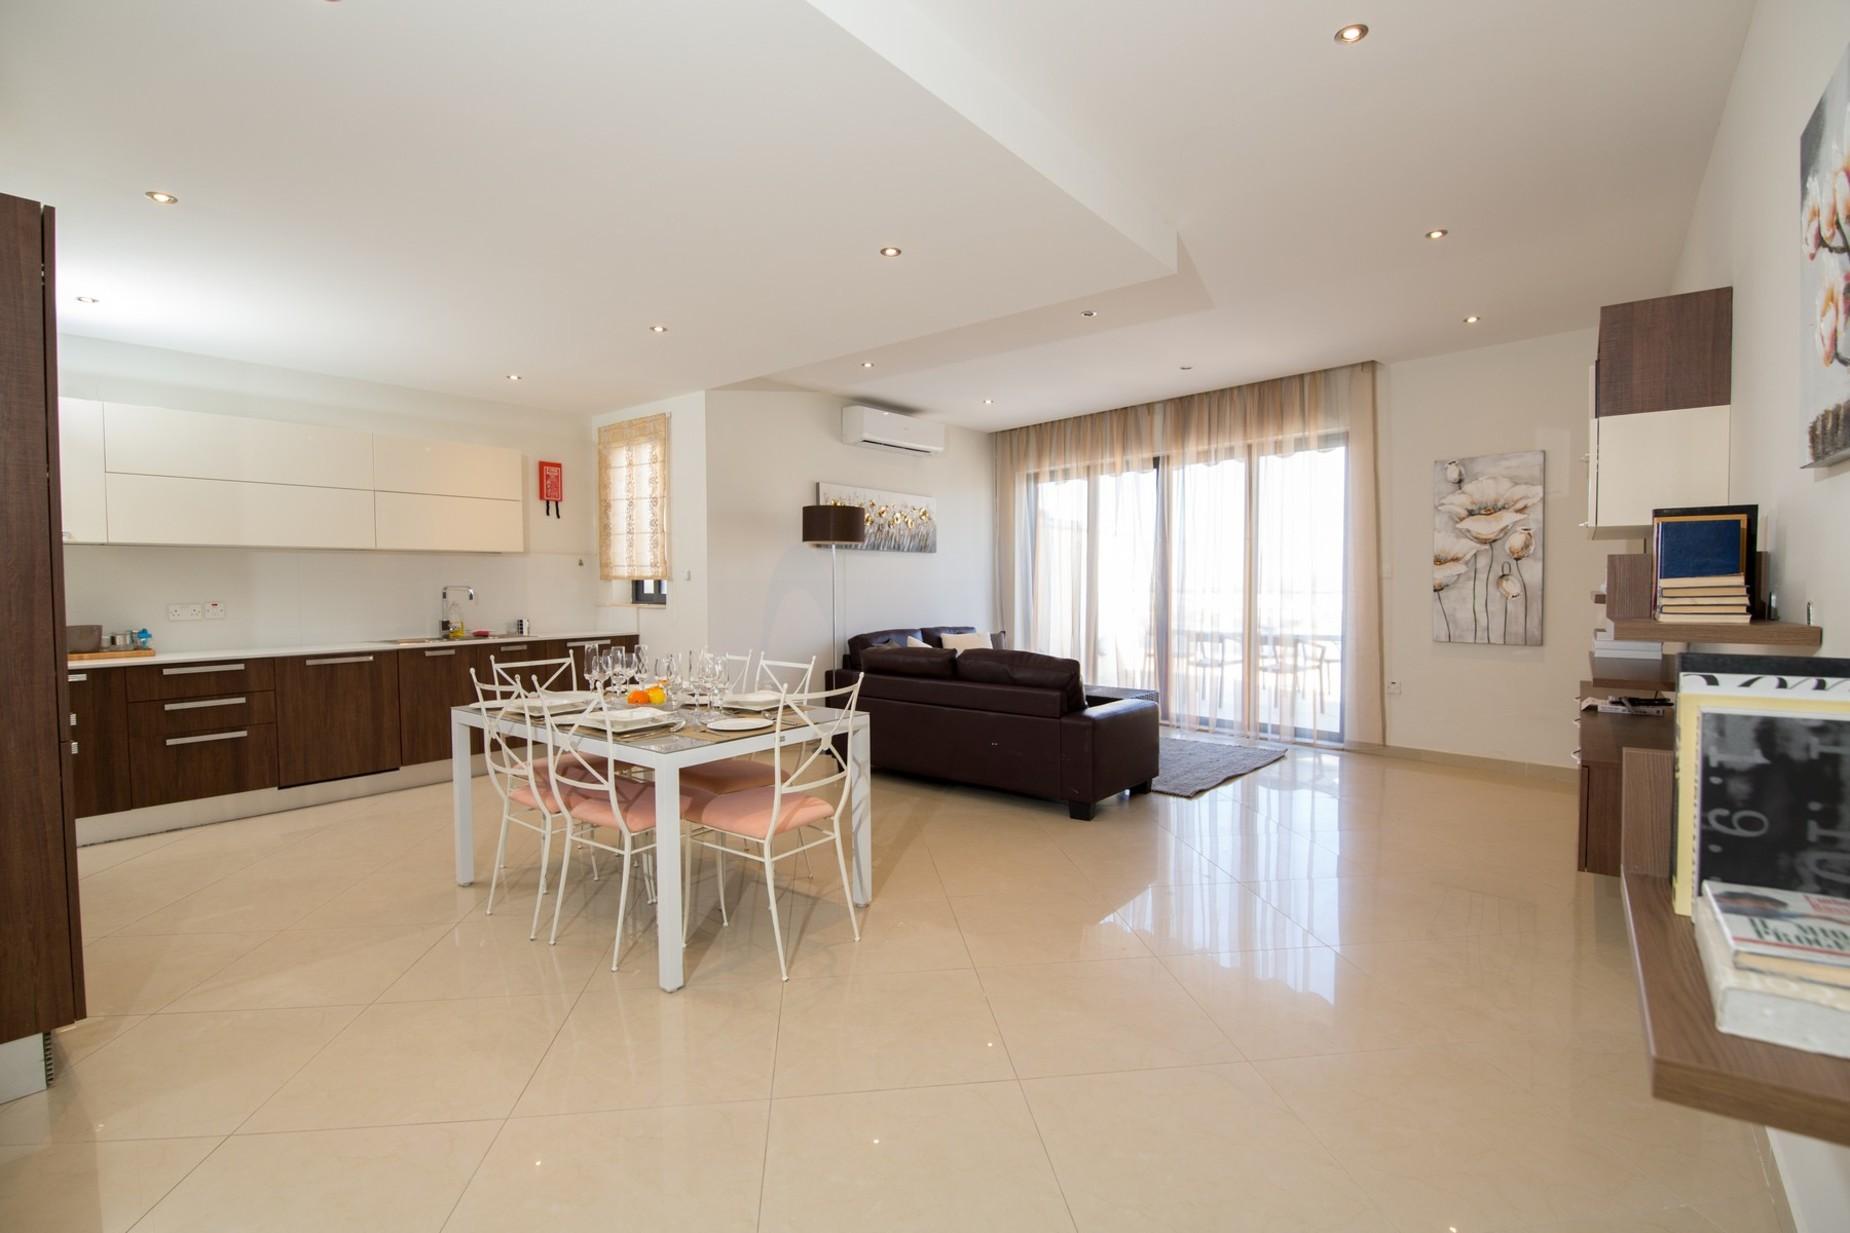 2 bed Apartment For Rent in Xemxija, Xemxija - thumb 7